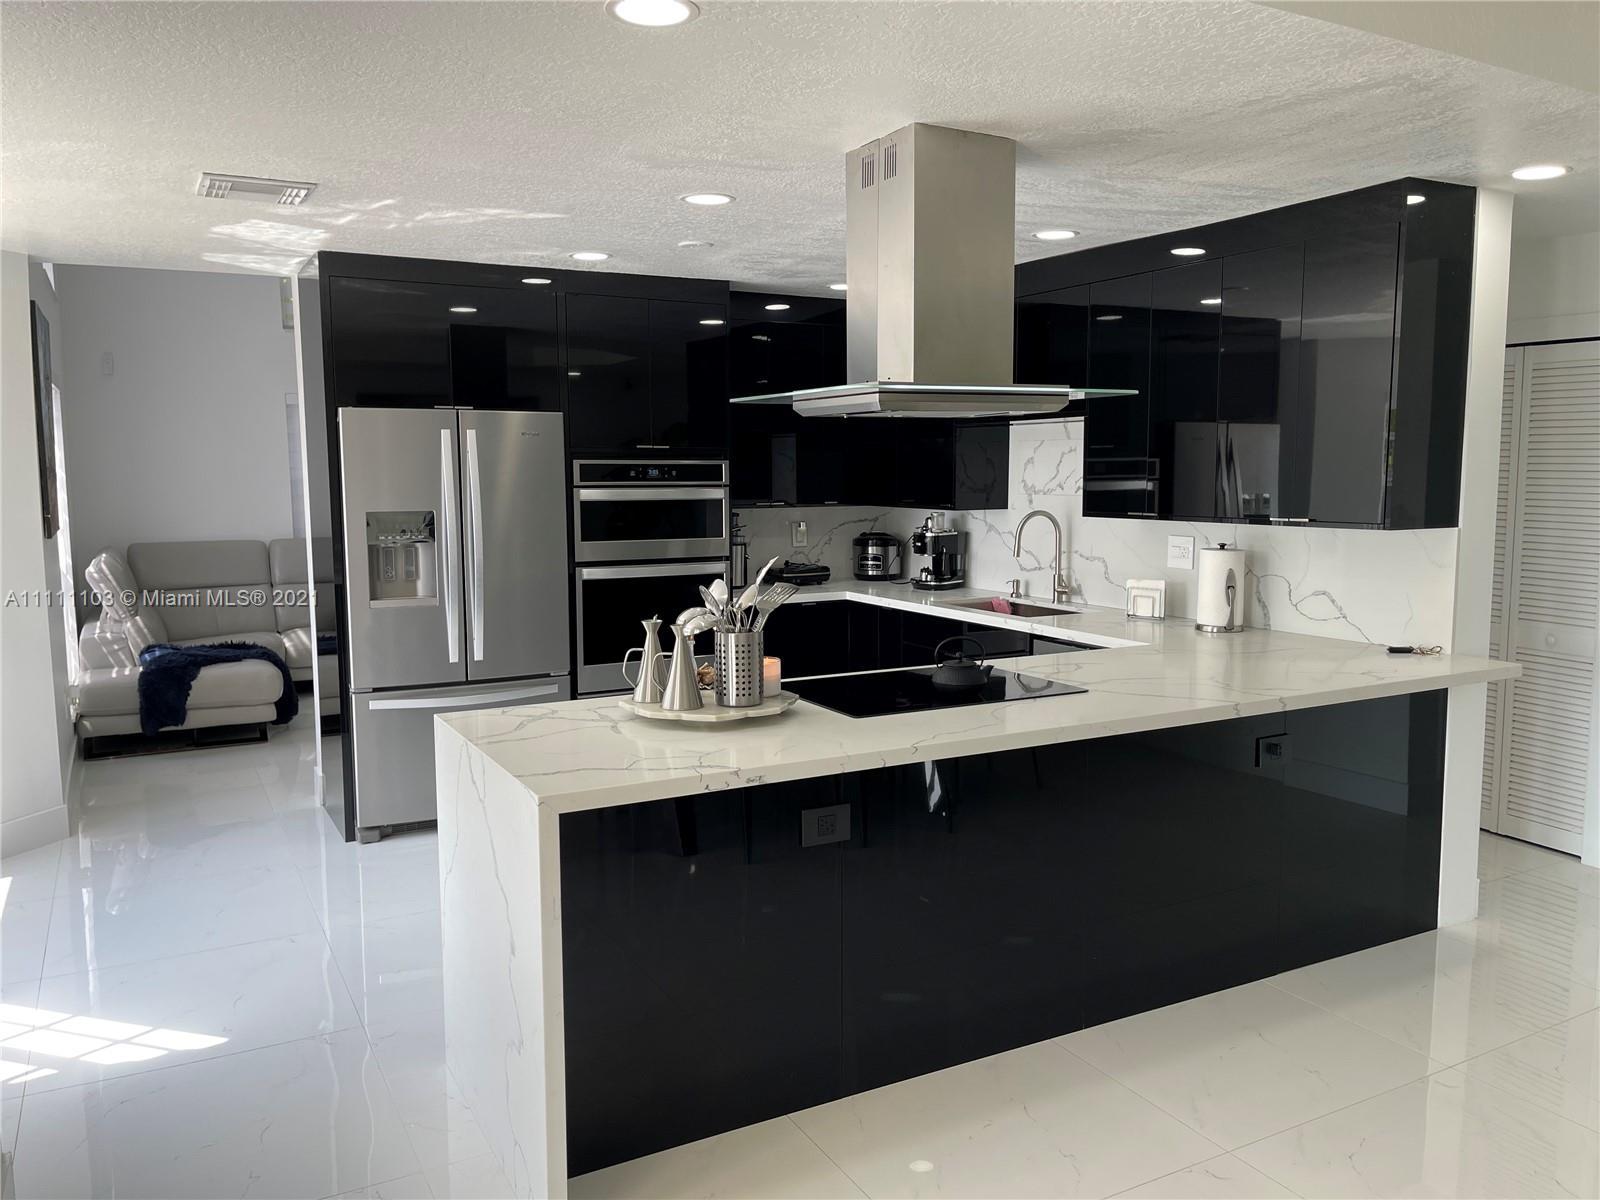 Single Family Home,For Sale,4232 SW 159th Ave, Miami, Florida 33185,Brickell,realty,broker,condos near me